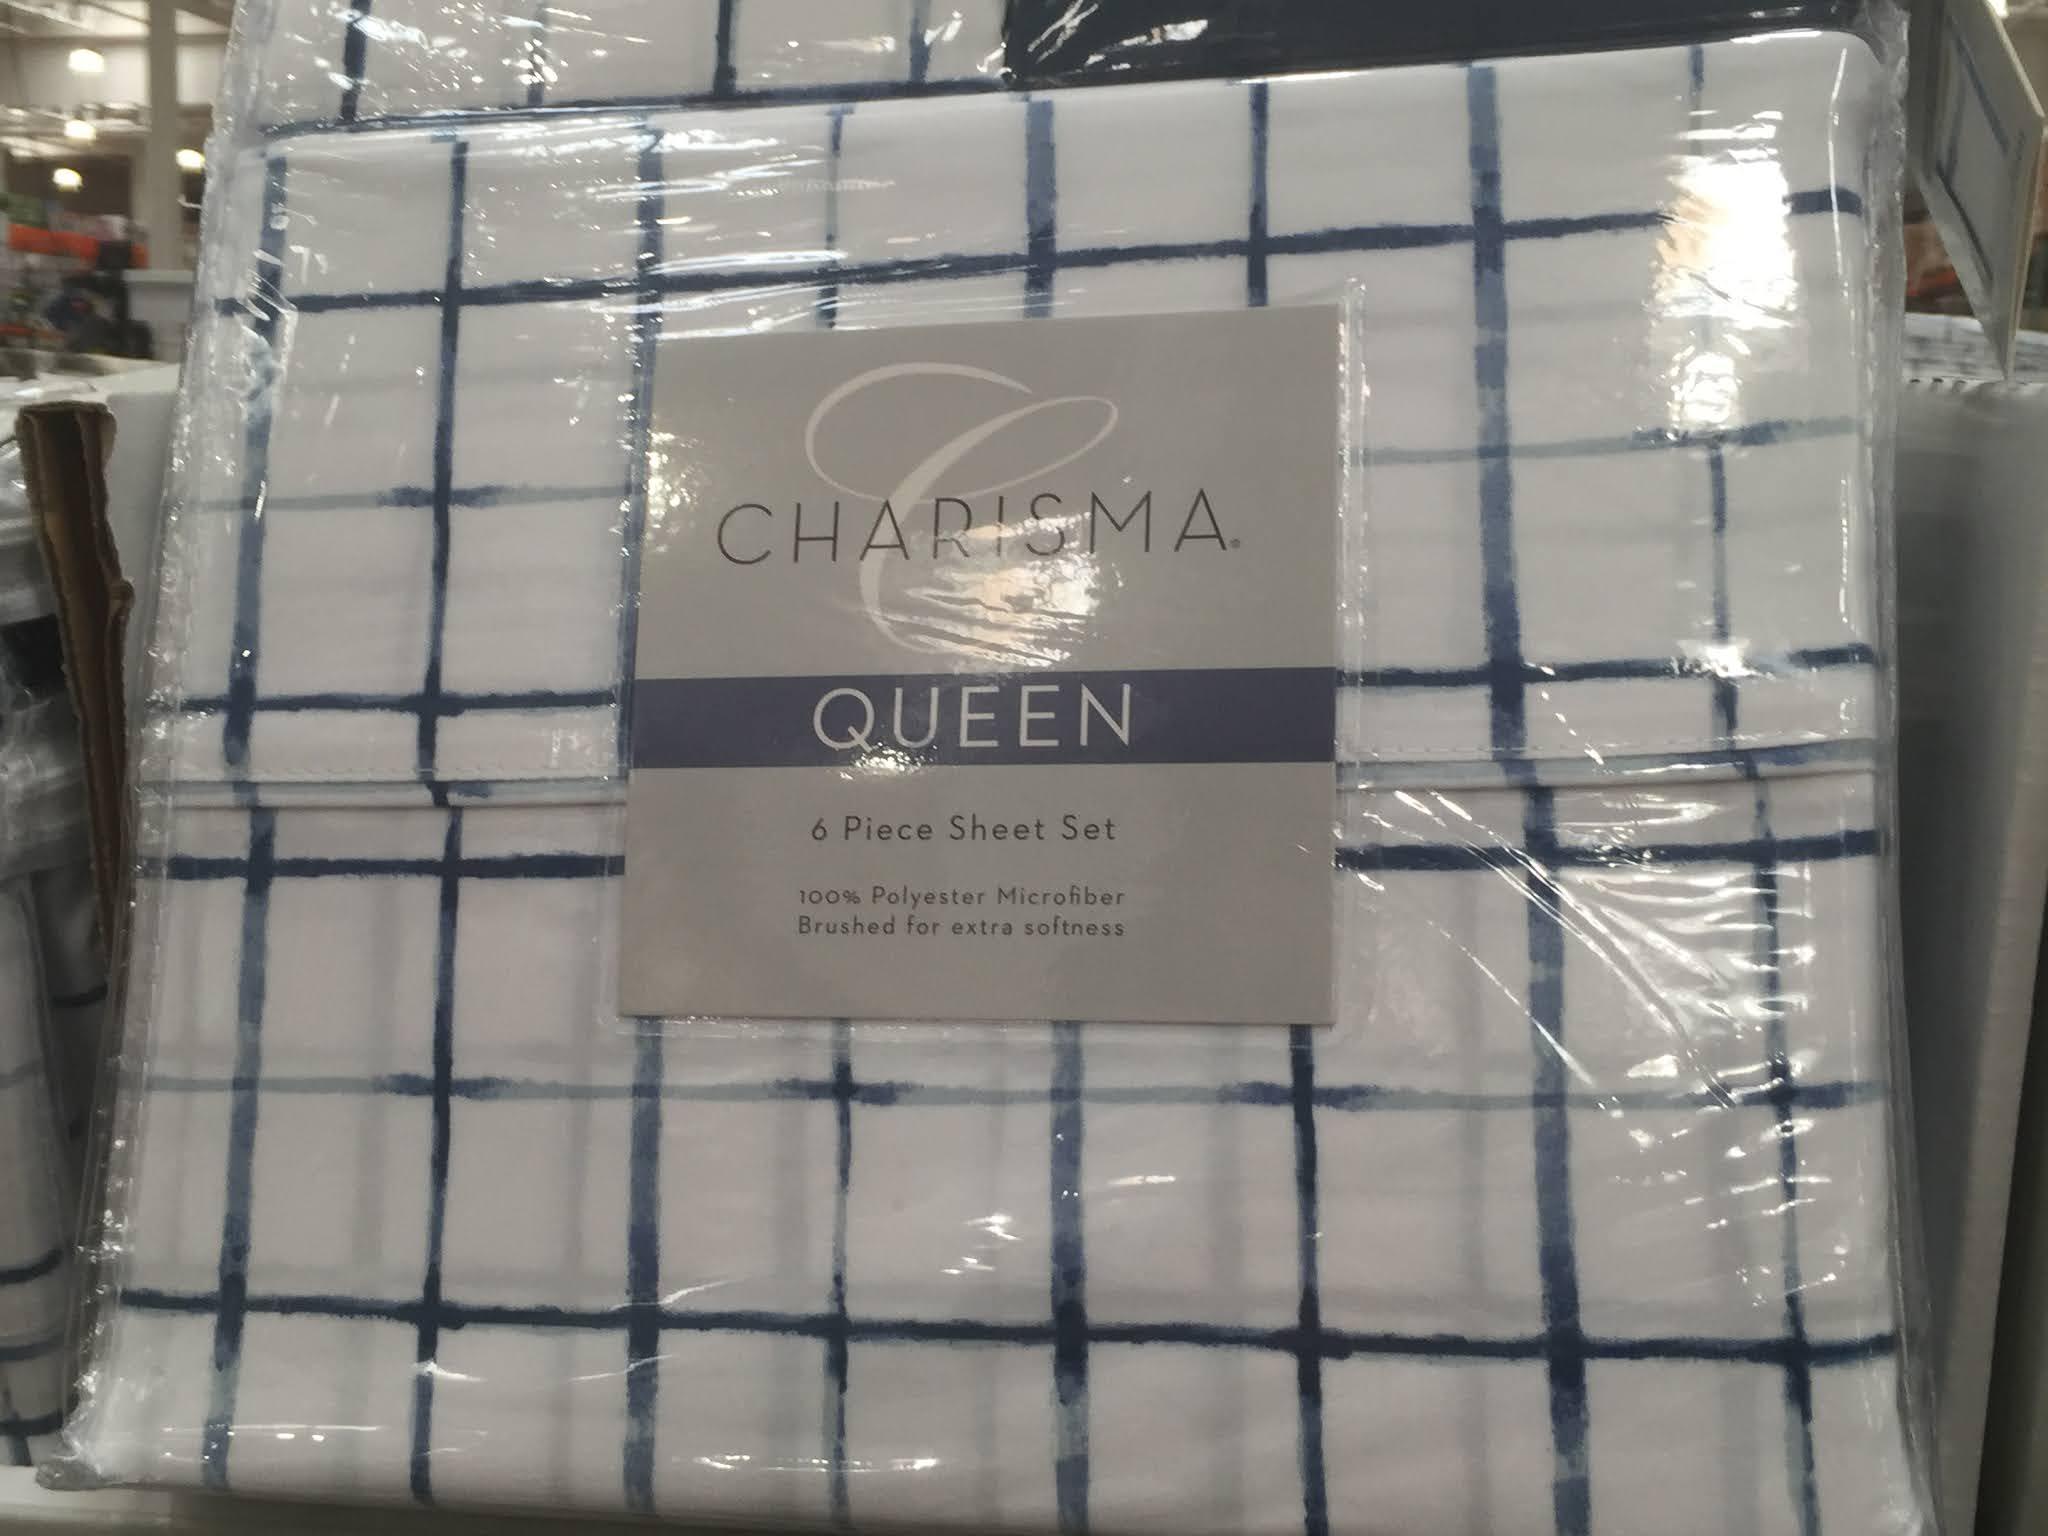 Enjoy a comfortable sleep with the Charisma 6-piece Microfiber Sheet Set